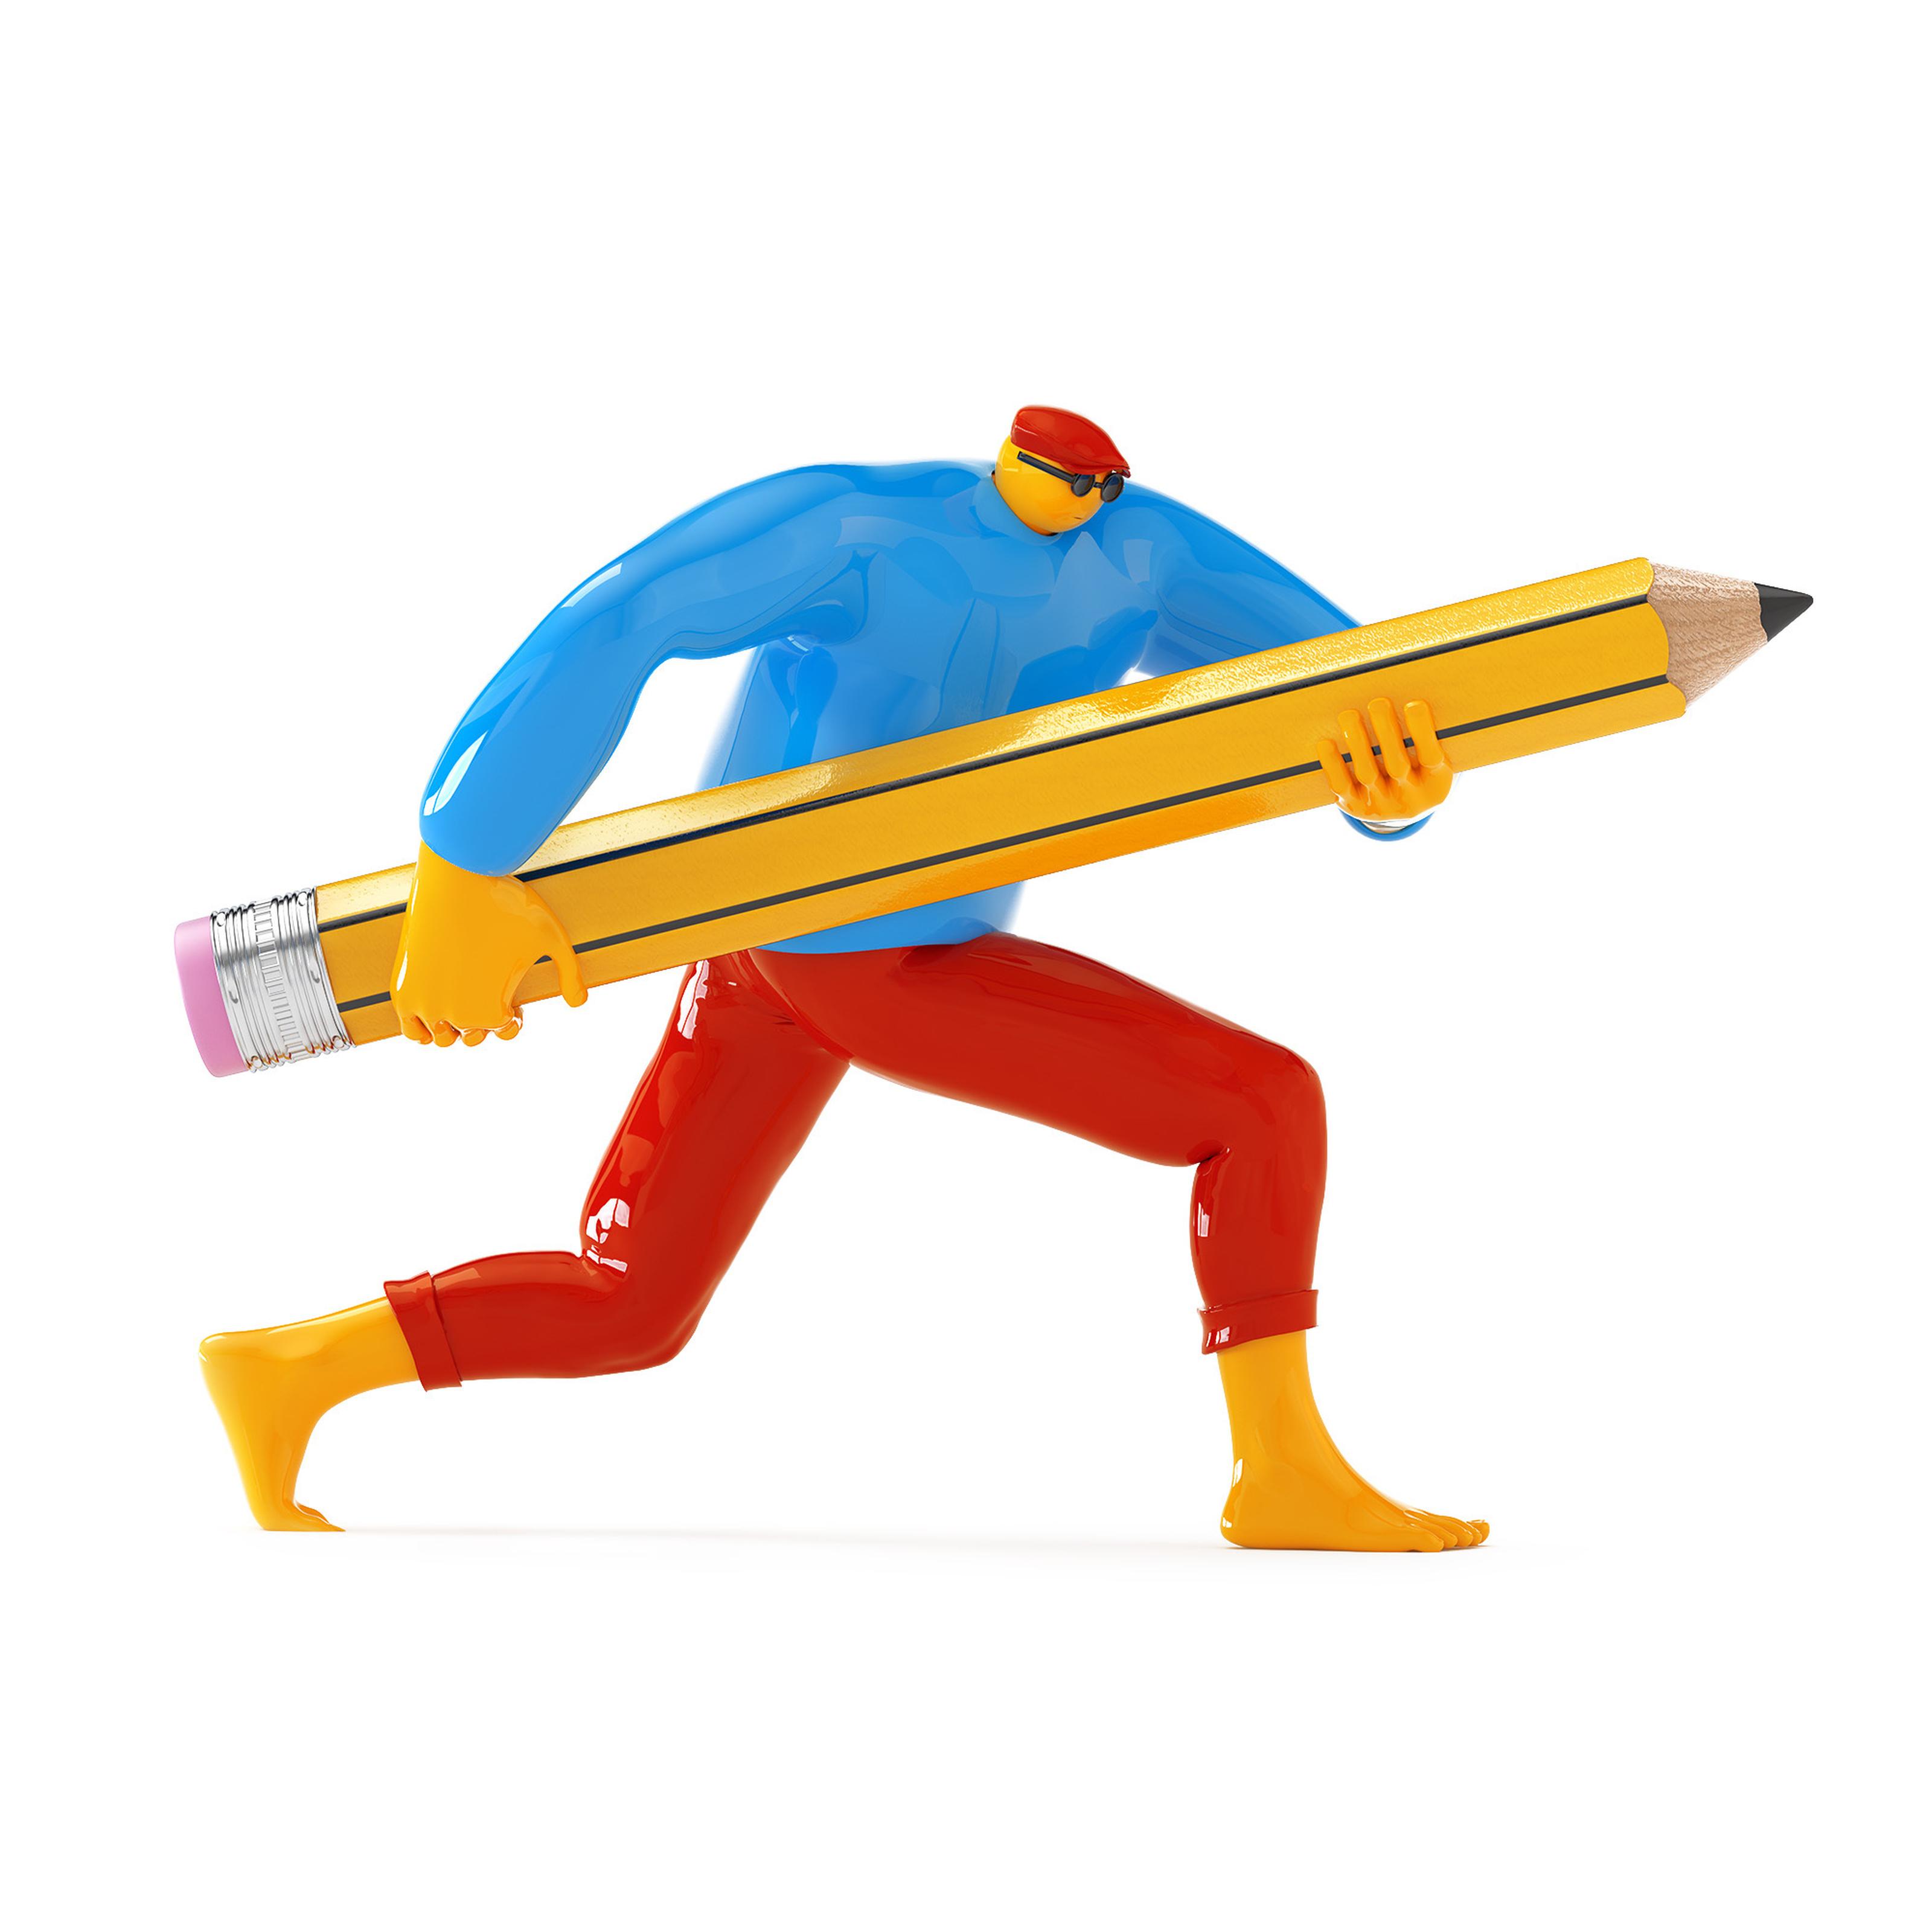 Pencilboyport